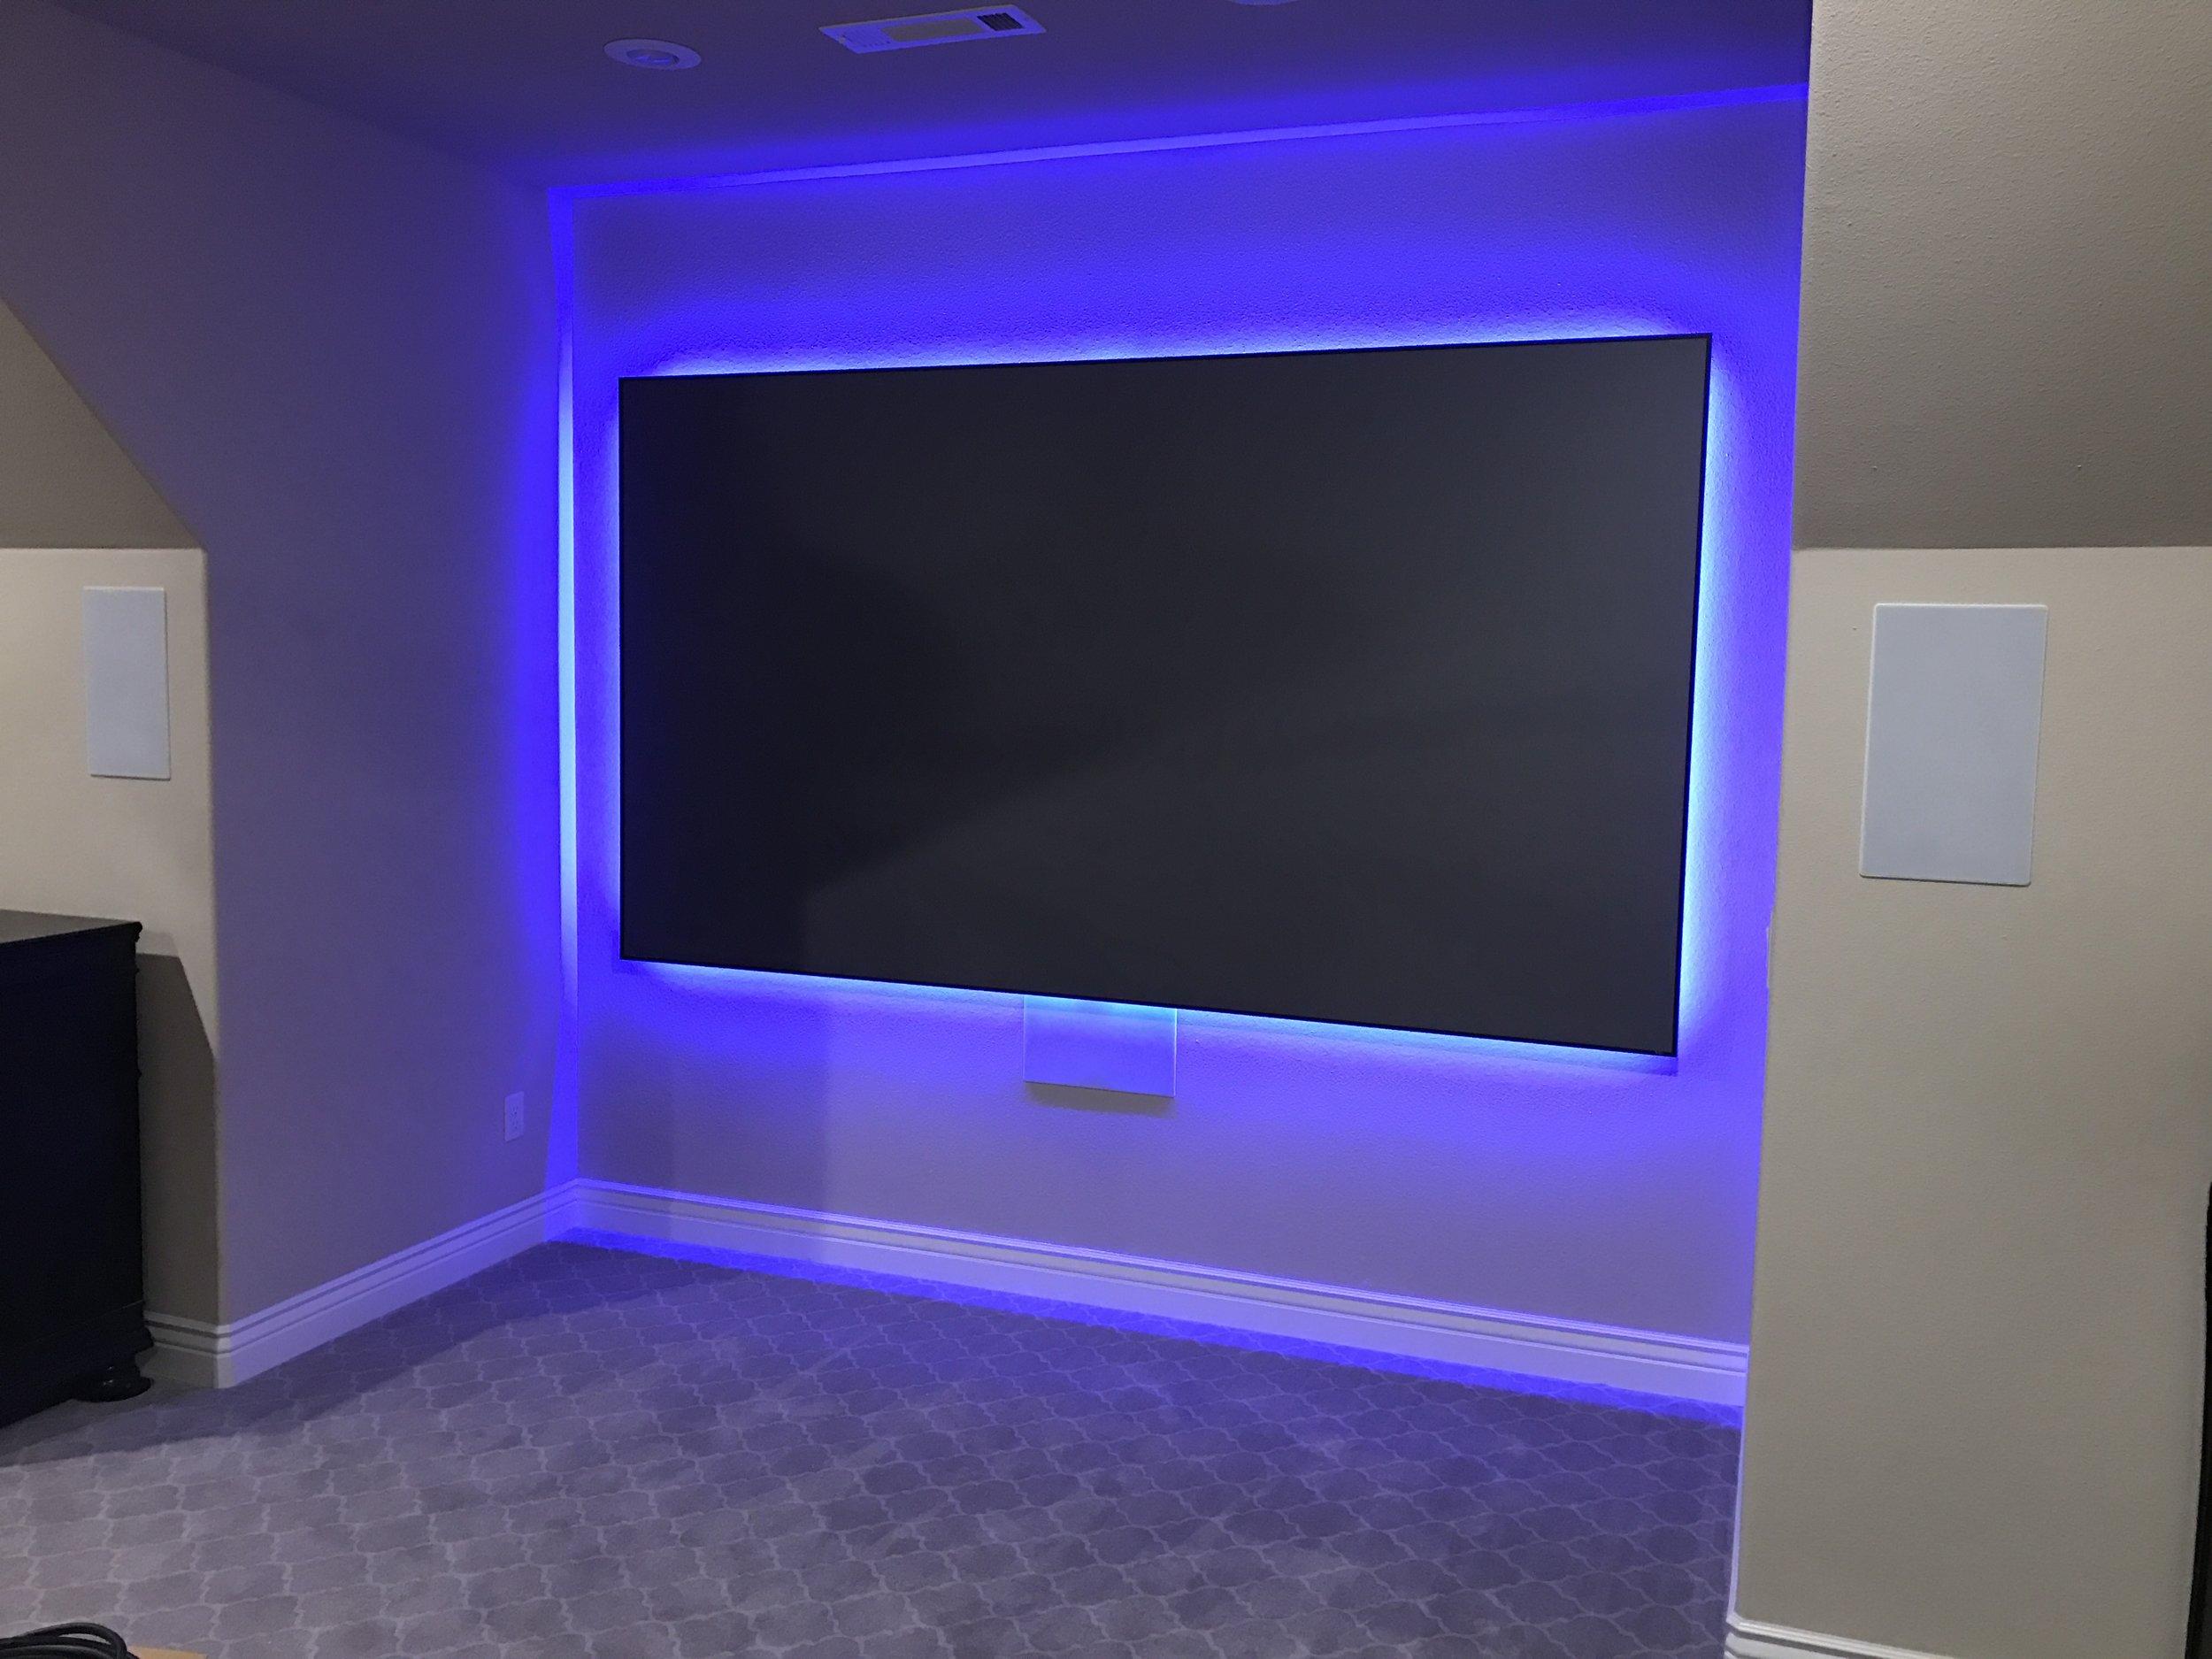 Sleek, clean design and installation. No wires, no mess, no problem